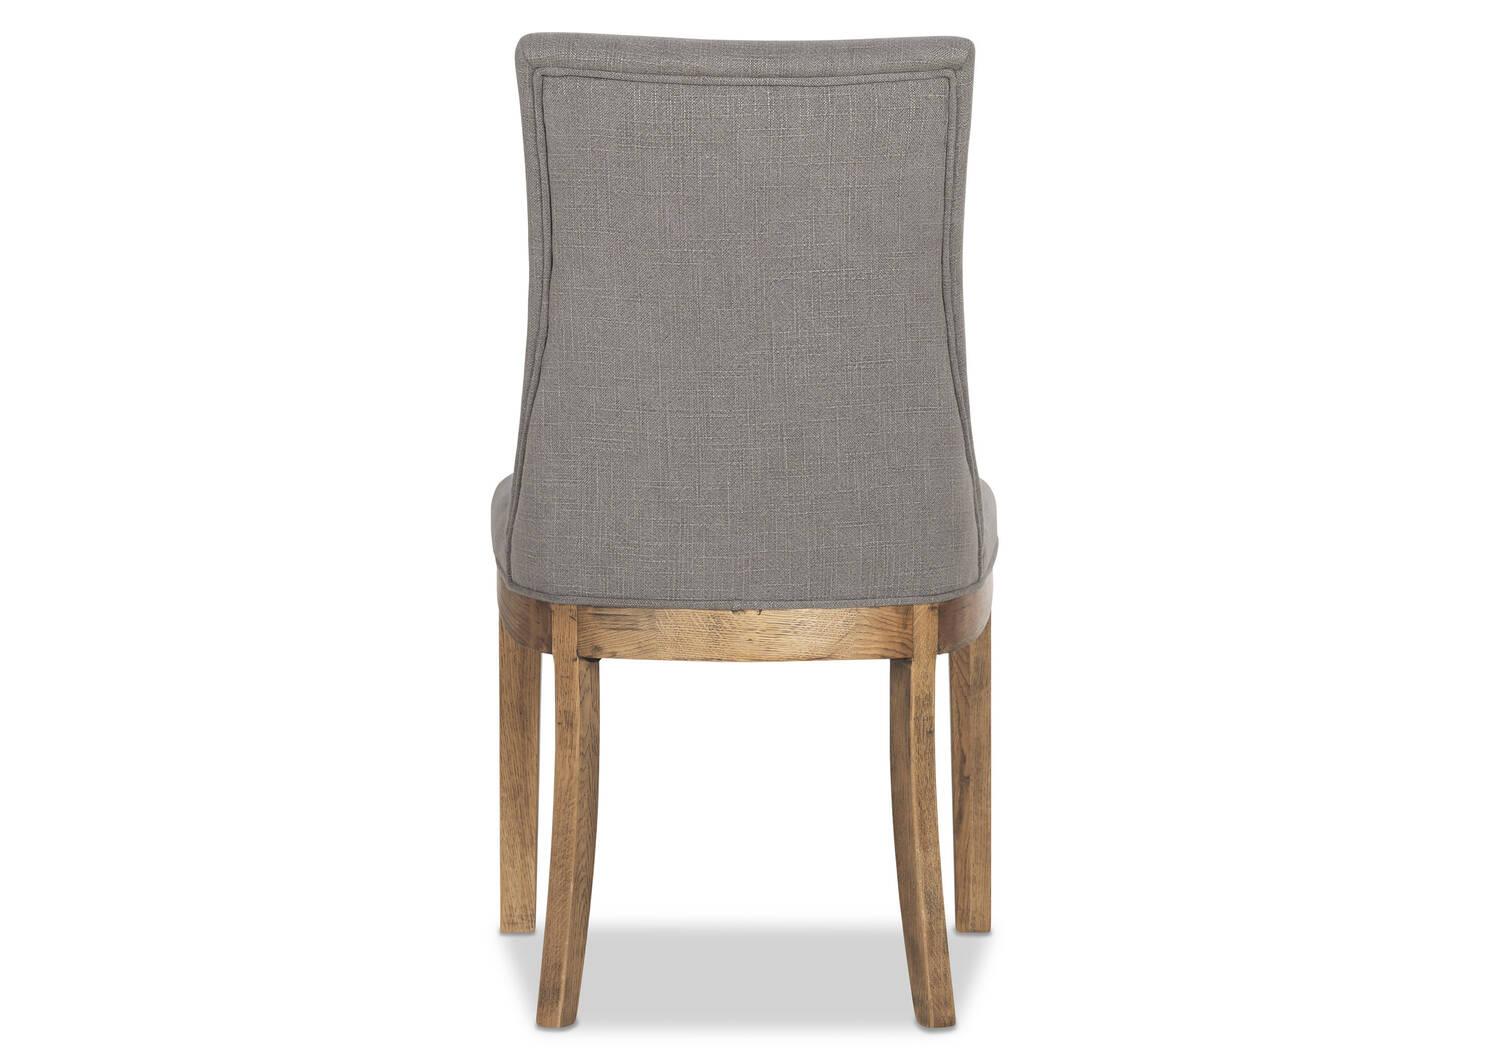 Decatur Dining Chair -Nantucket Grey